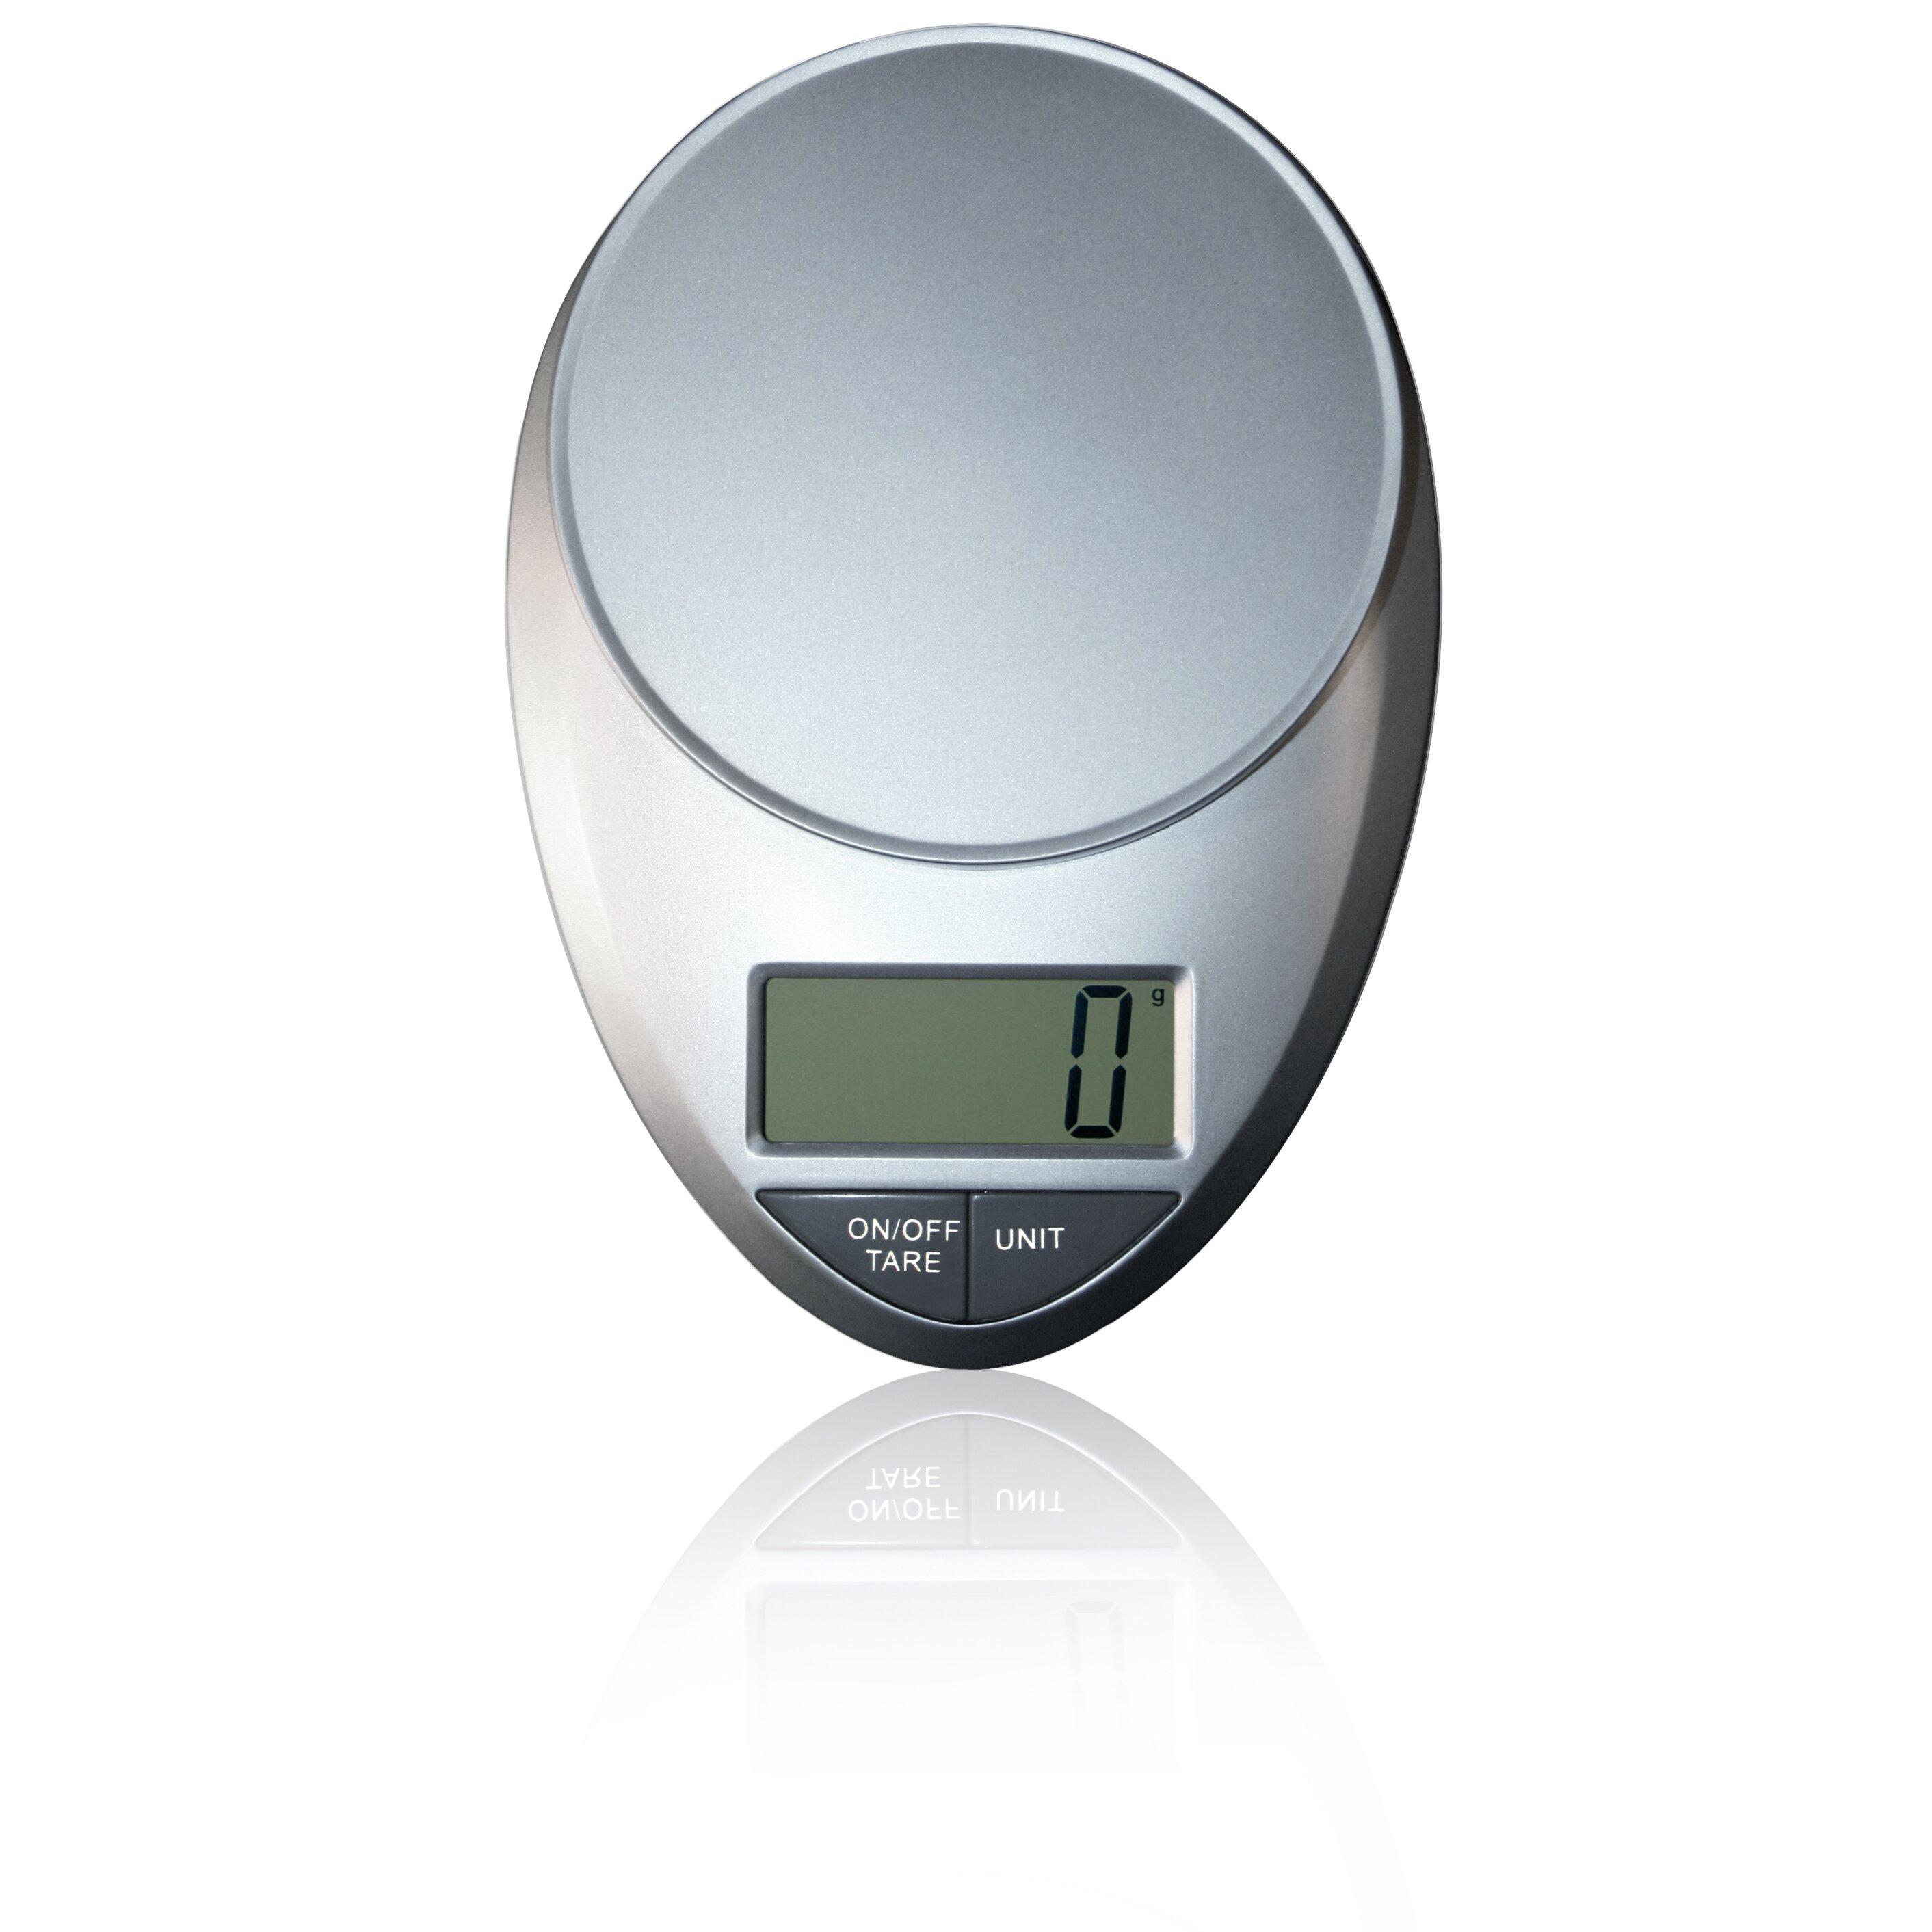 Eatsmart Precision Pro Digital Kitchen Scale In Silver Reviews Wayfair